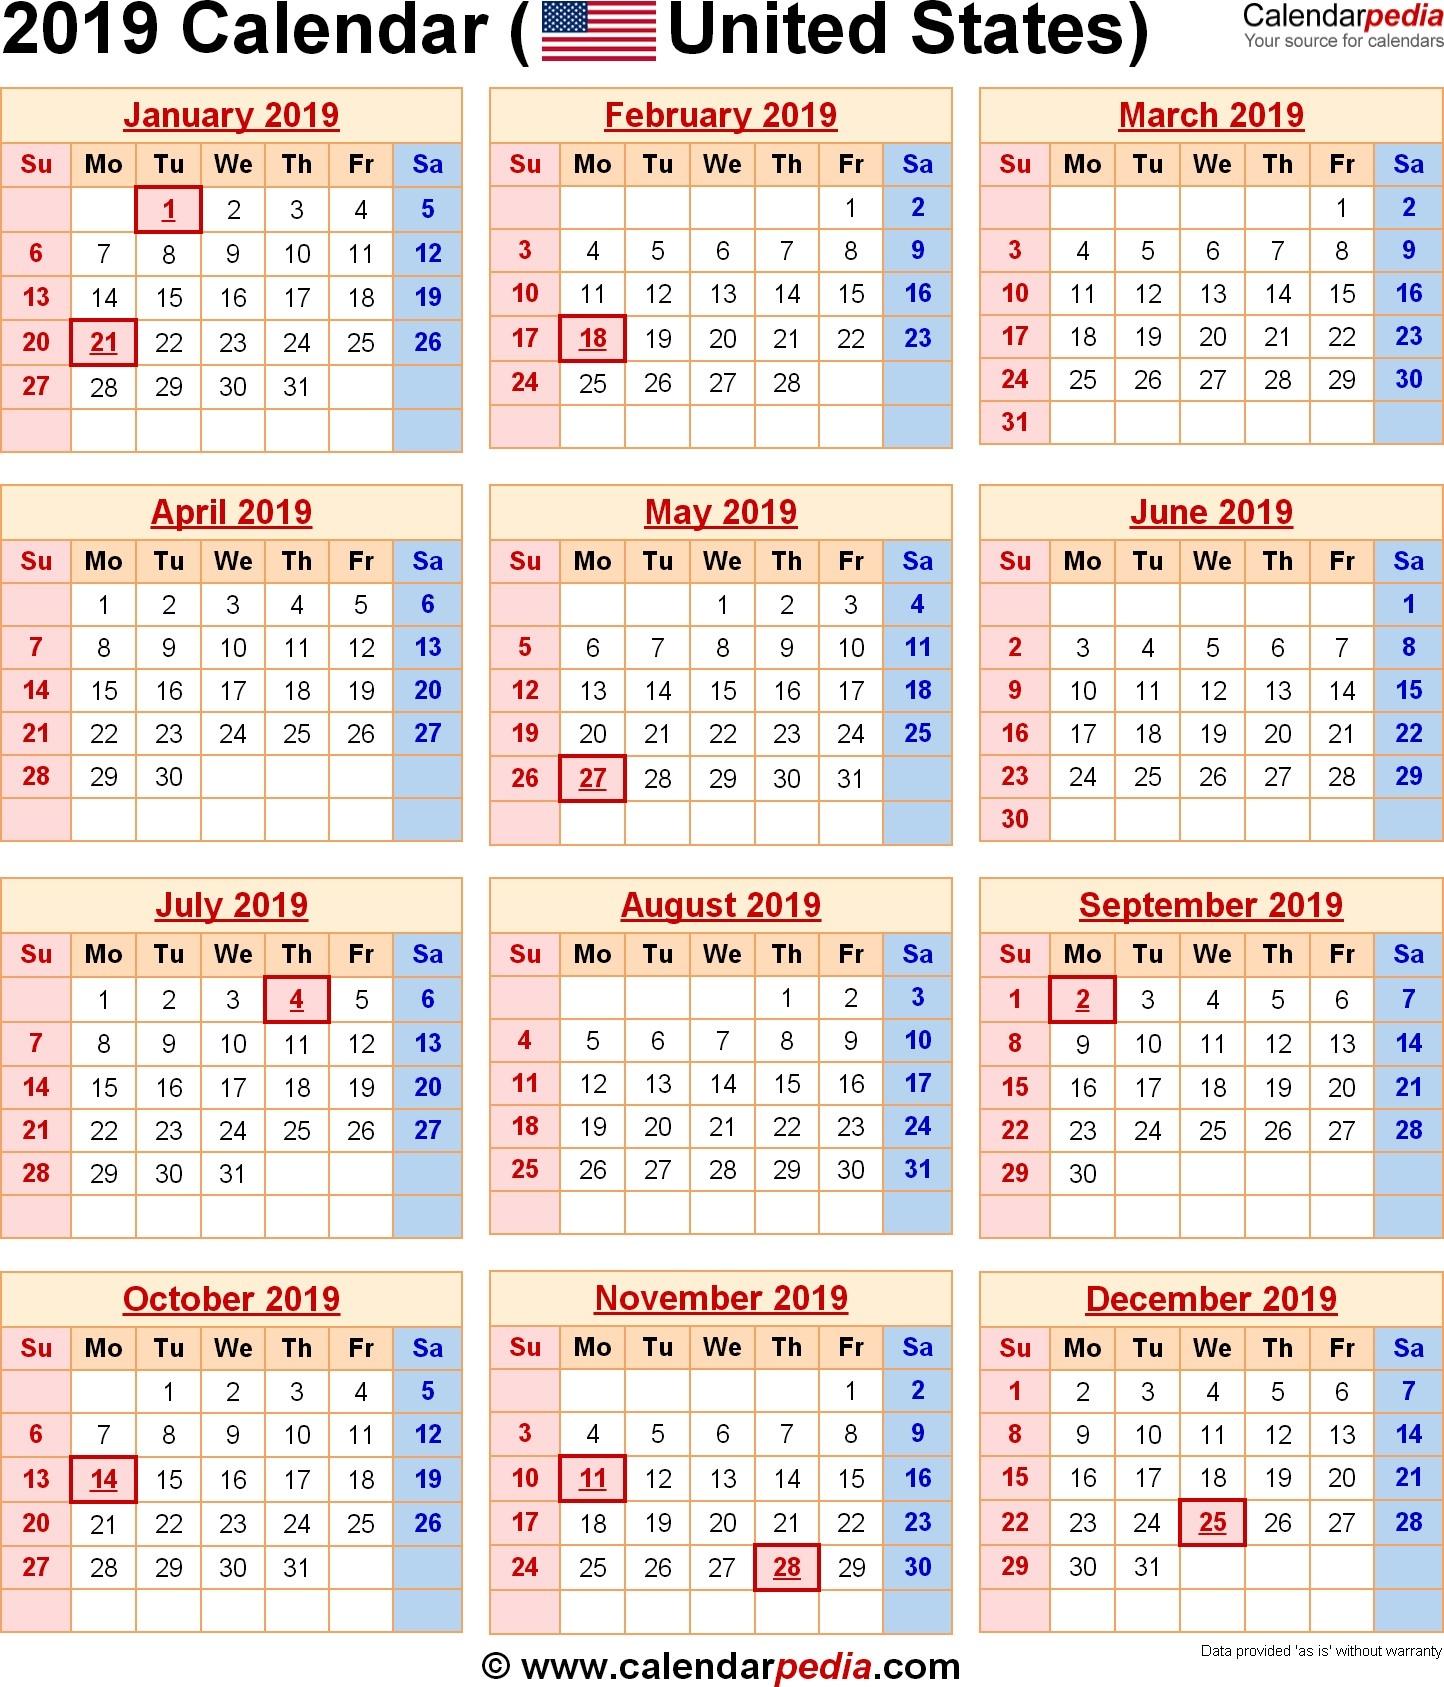 2019 Calendar Download 17 Free Printable Excel Templates Xlsx Calendar 2019 Xlsx